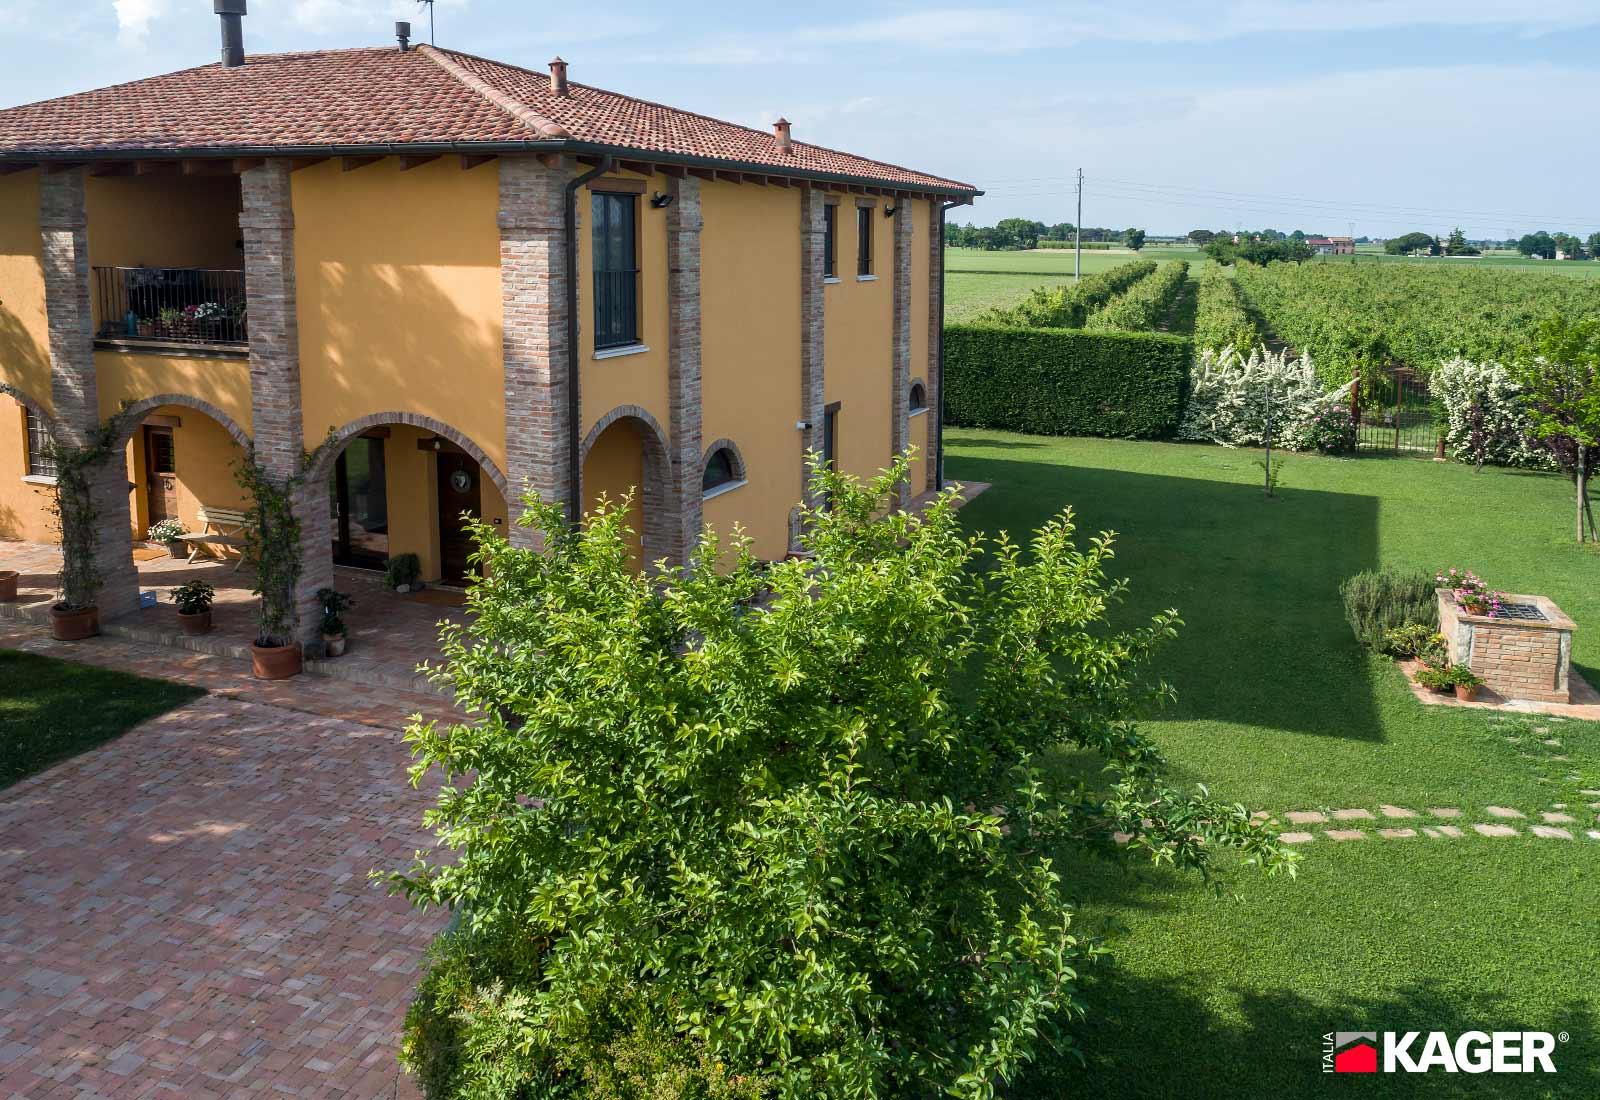 Casa-in-legno-Ferrara-Kager-Italia-05